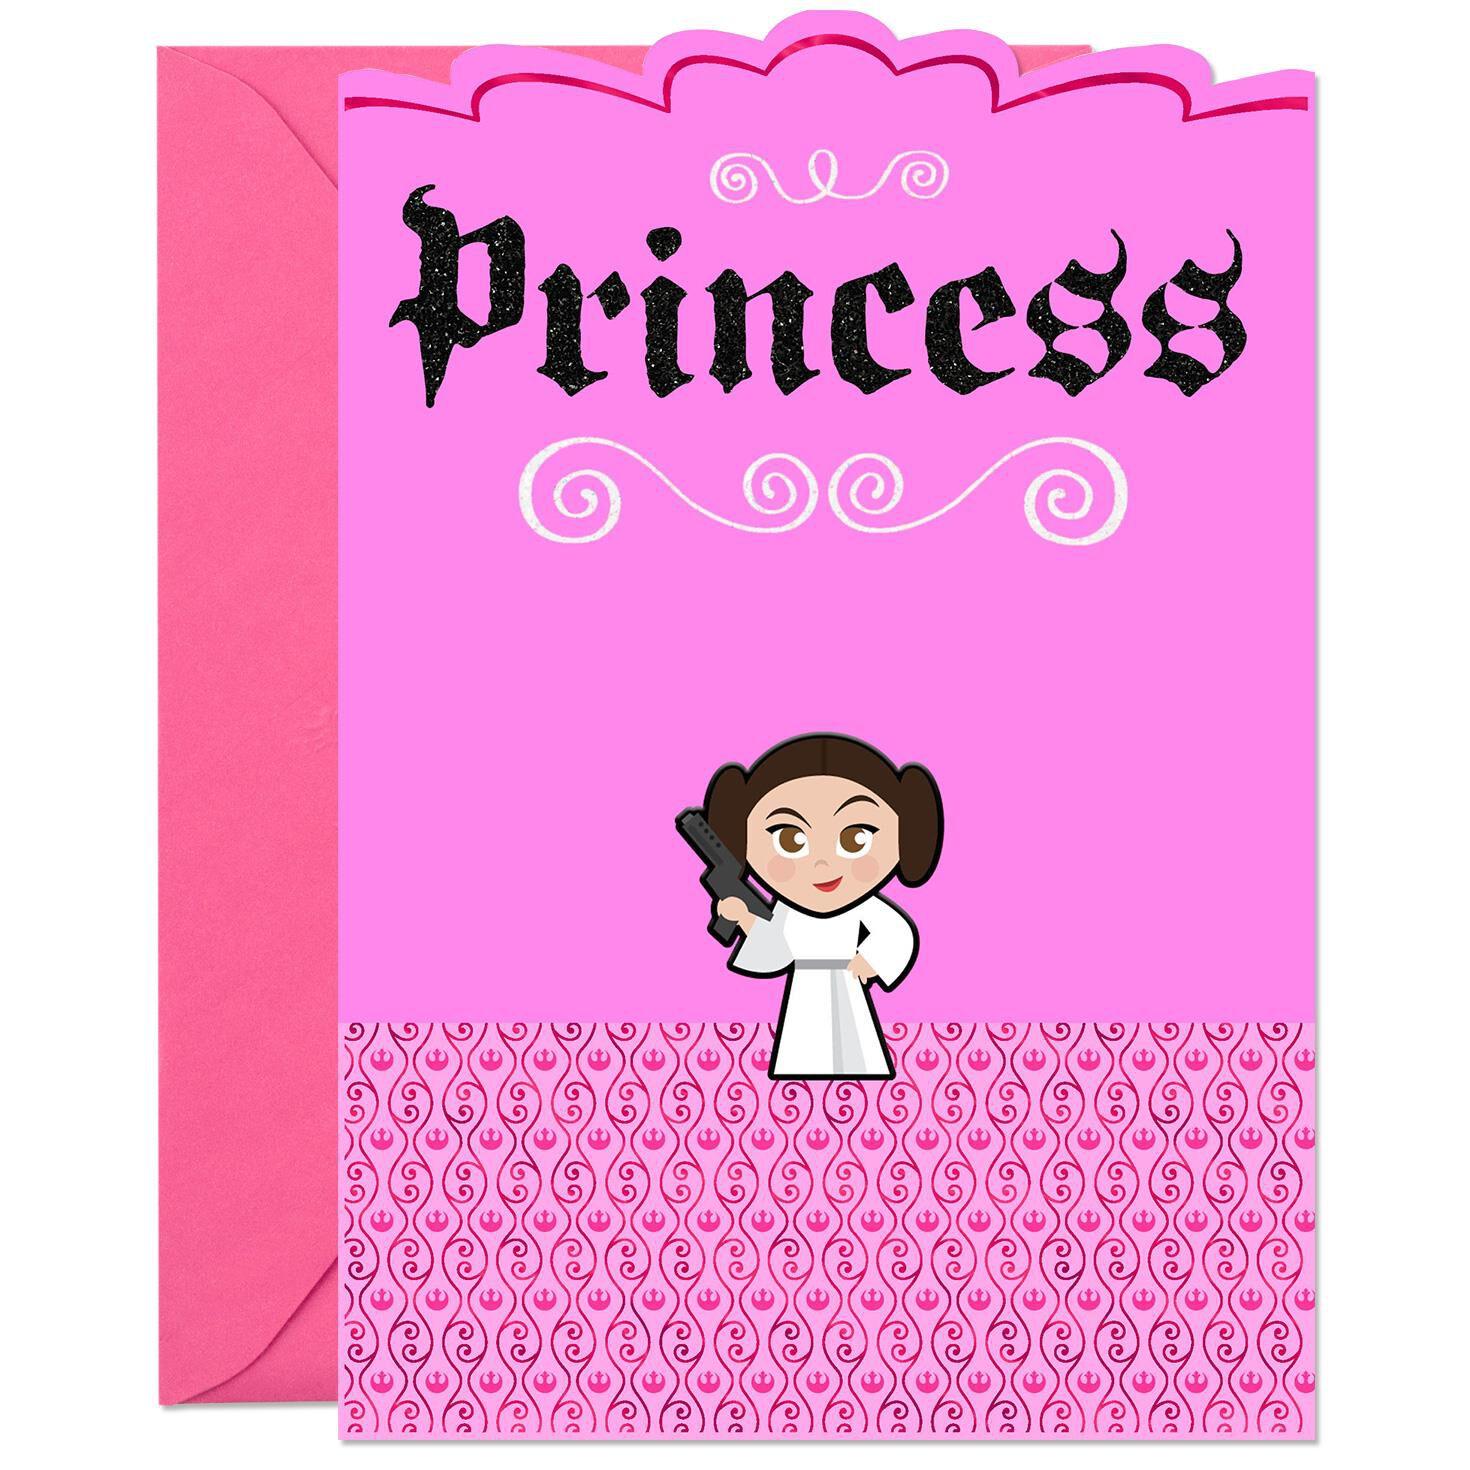 Star Wars Princess Leia Awesome Girl Birthday Card Greeting Jpg 1024x1024 Invitation Pink Lightsaber